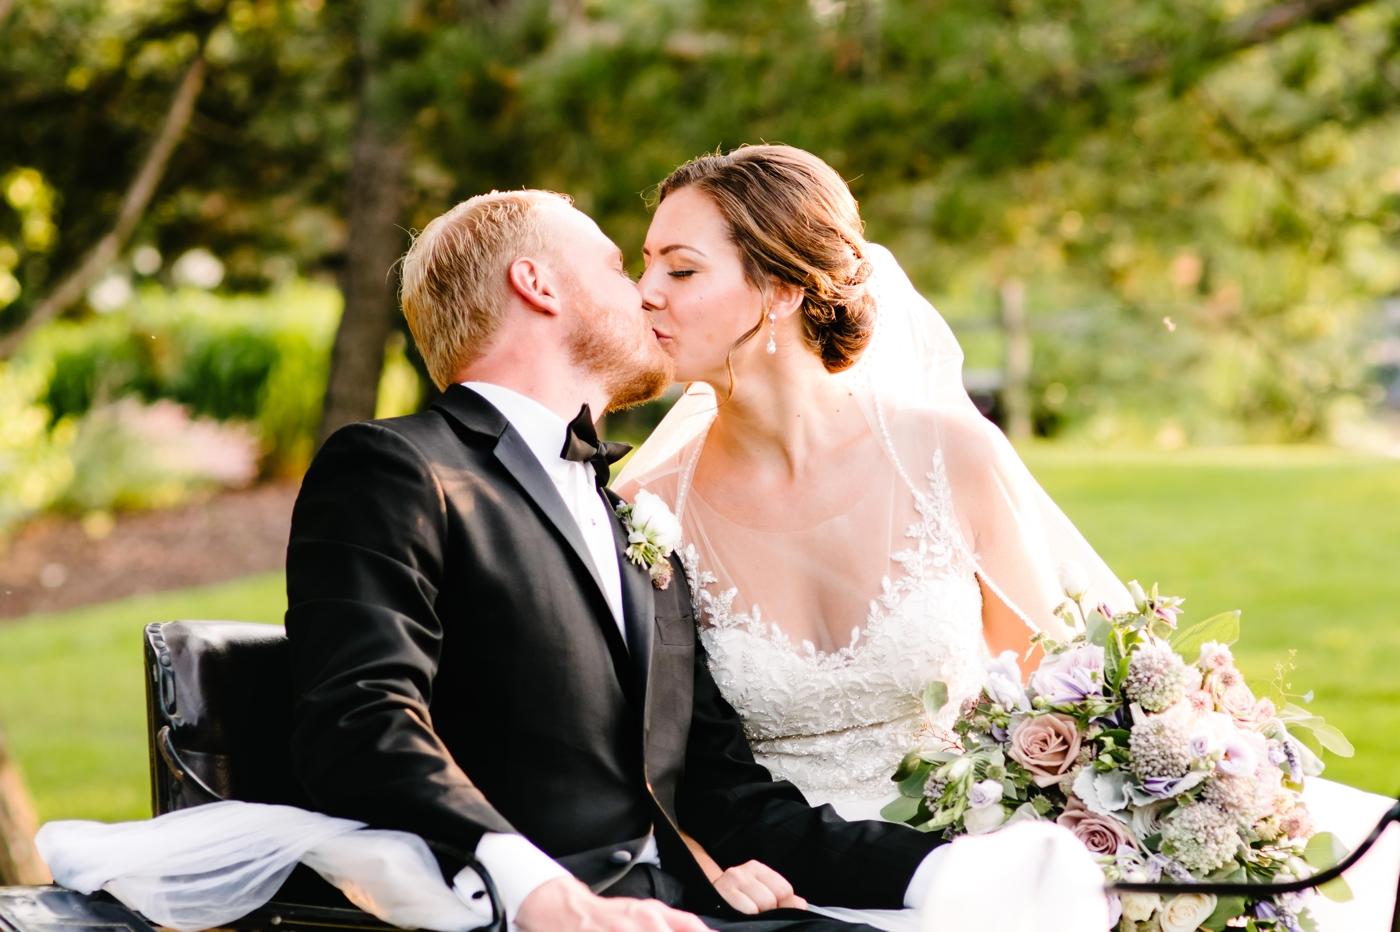 chicago-fine-art-wedding-photography-zuidema40